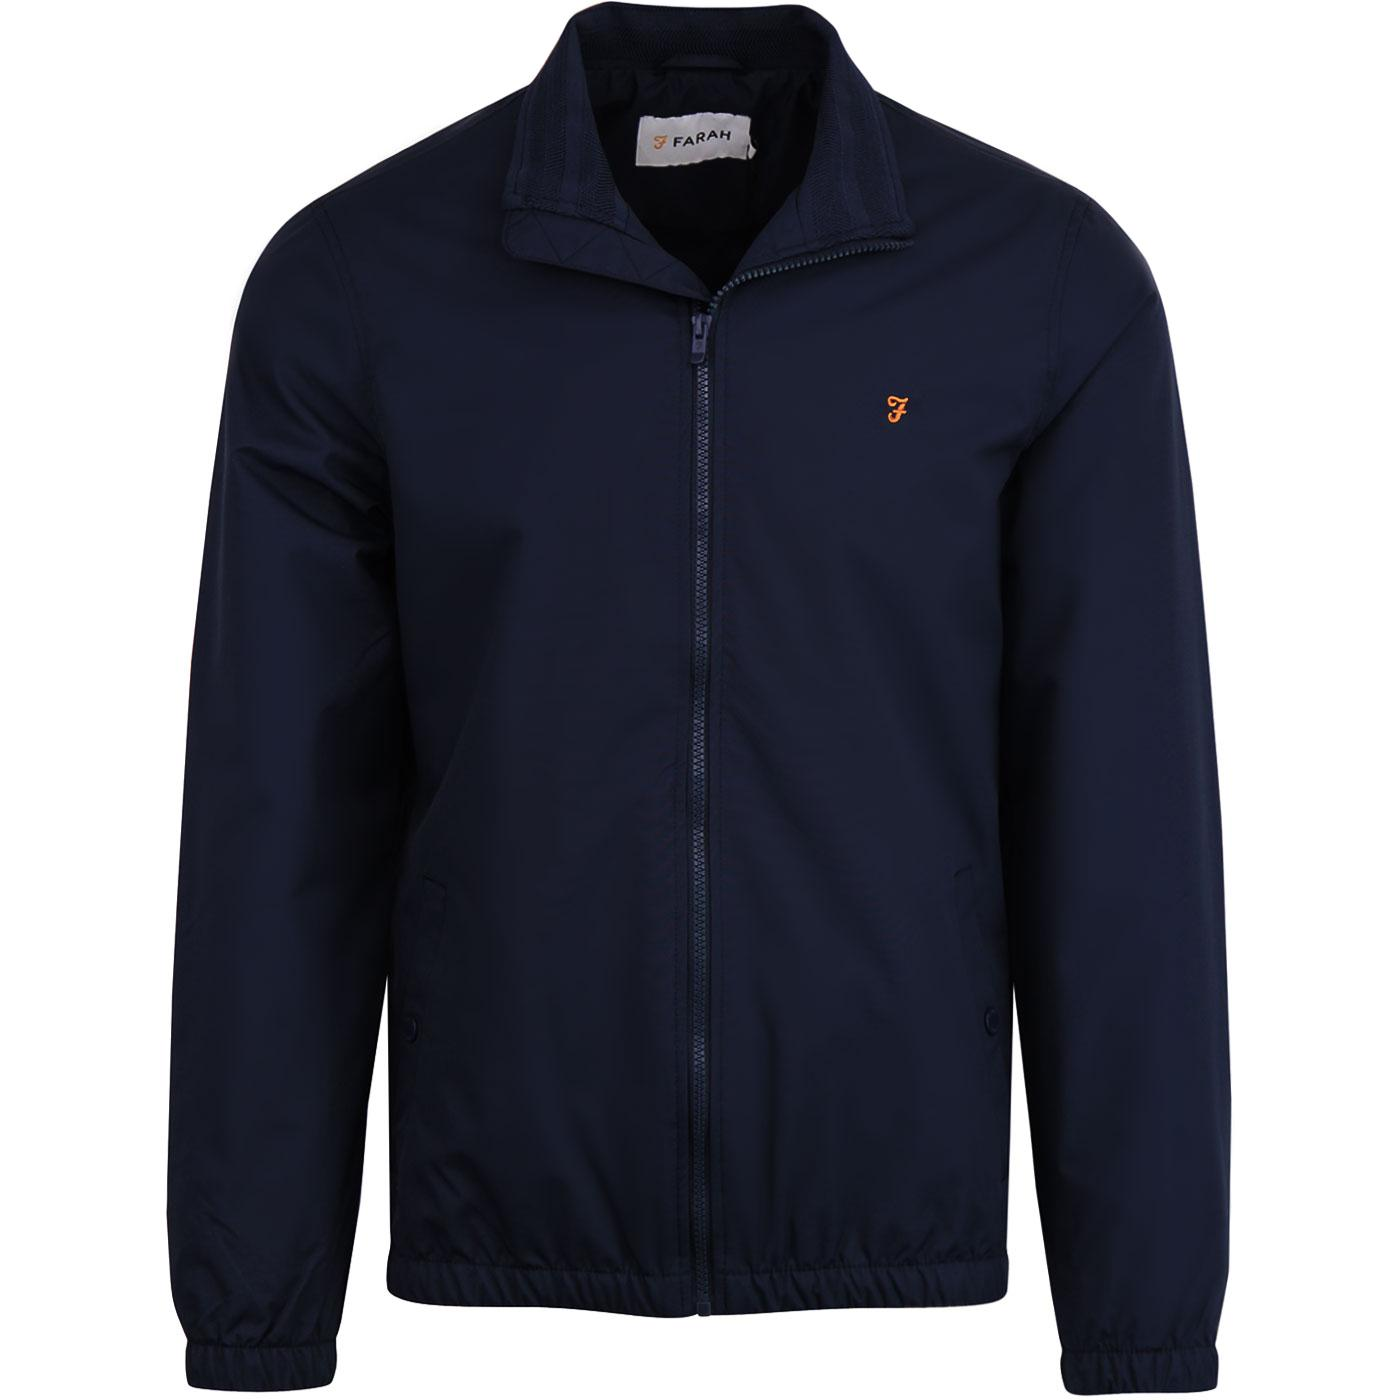 Olsen FARAH Mens Retro Zip Through Blouson Jacket